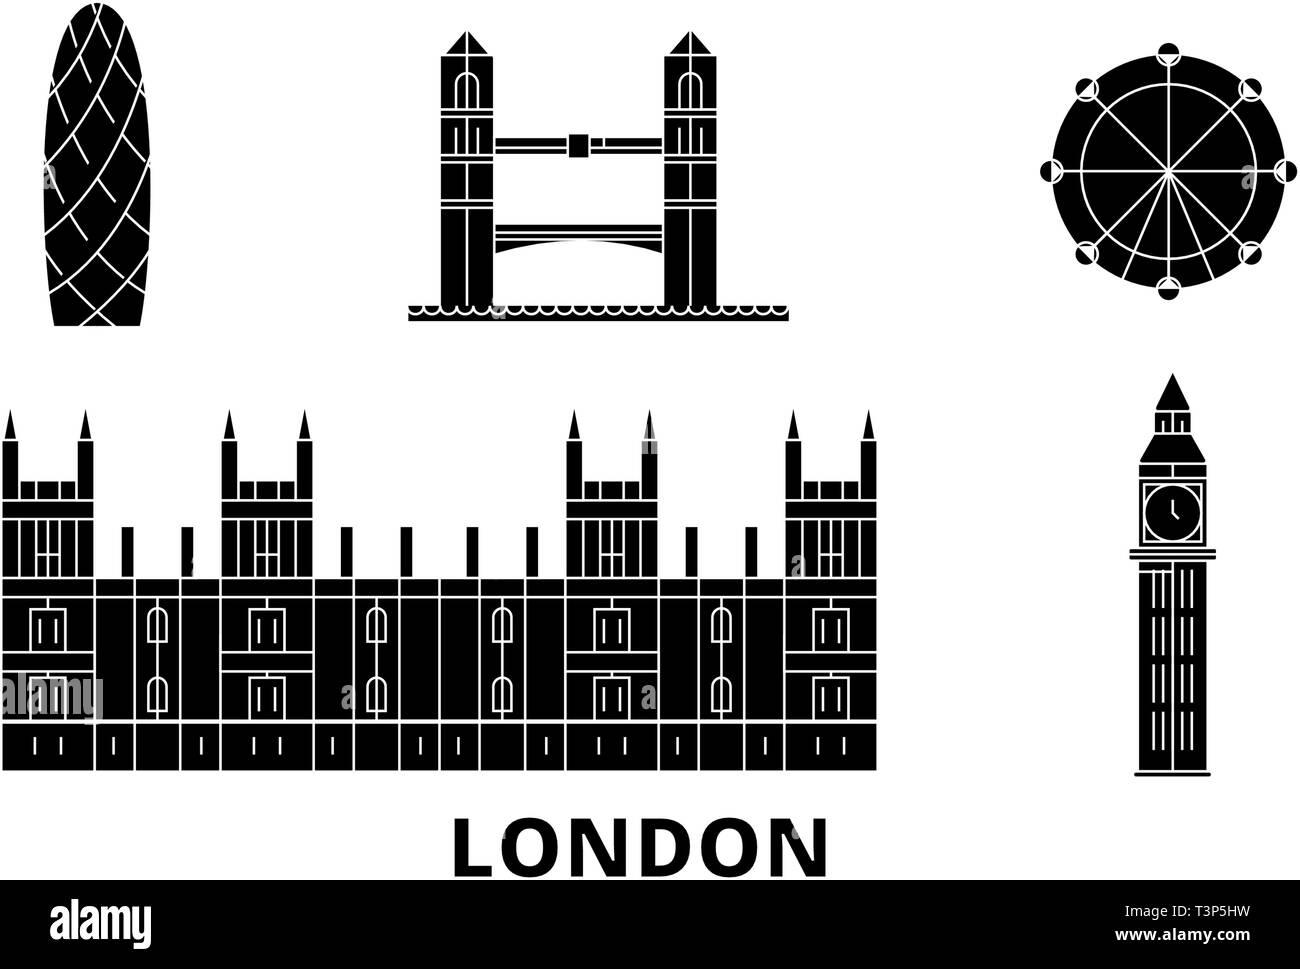 United Kingdom, London City flat travel skyline set. United Kingdom, London City black city vector illustration, symbol, travel sights, landmarks. - Stock Image